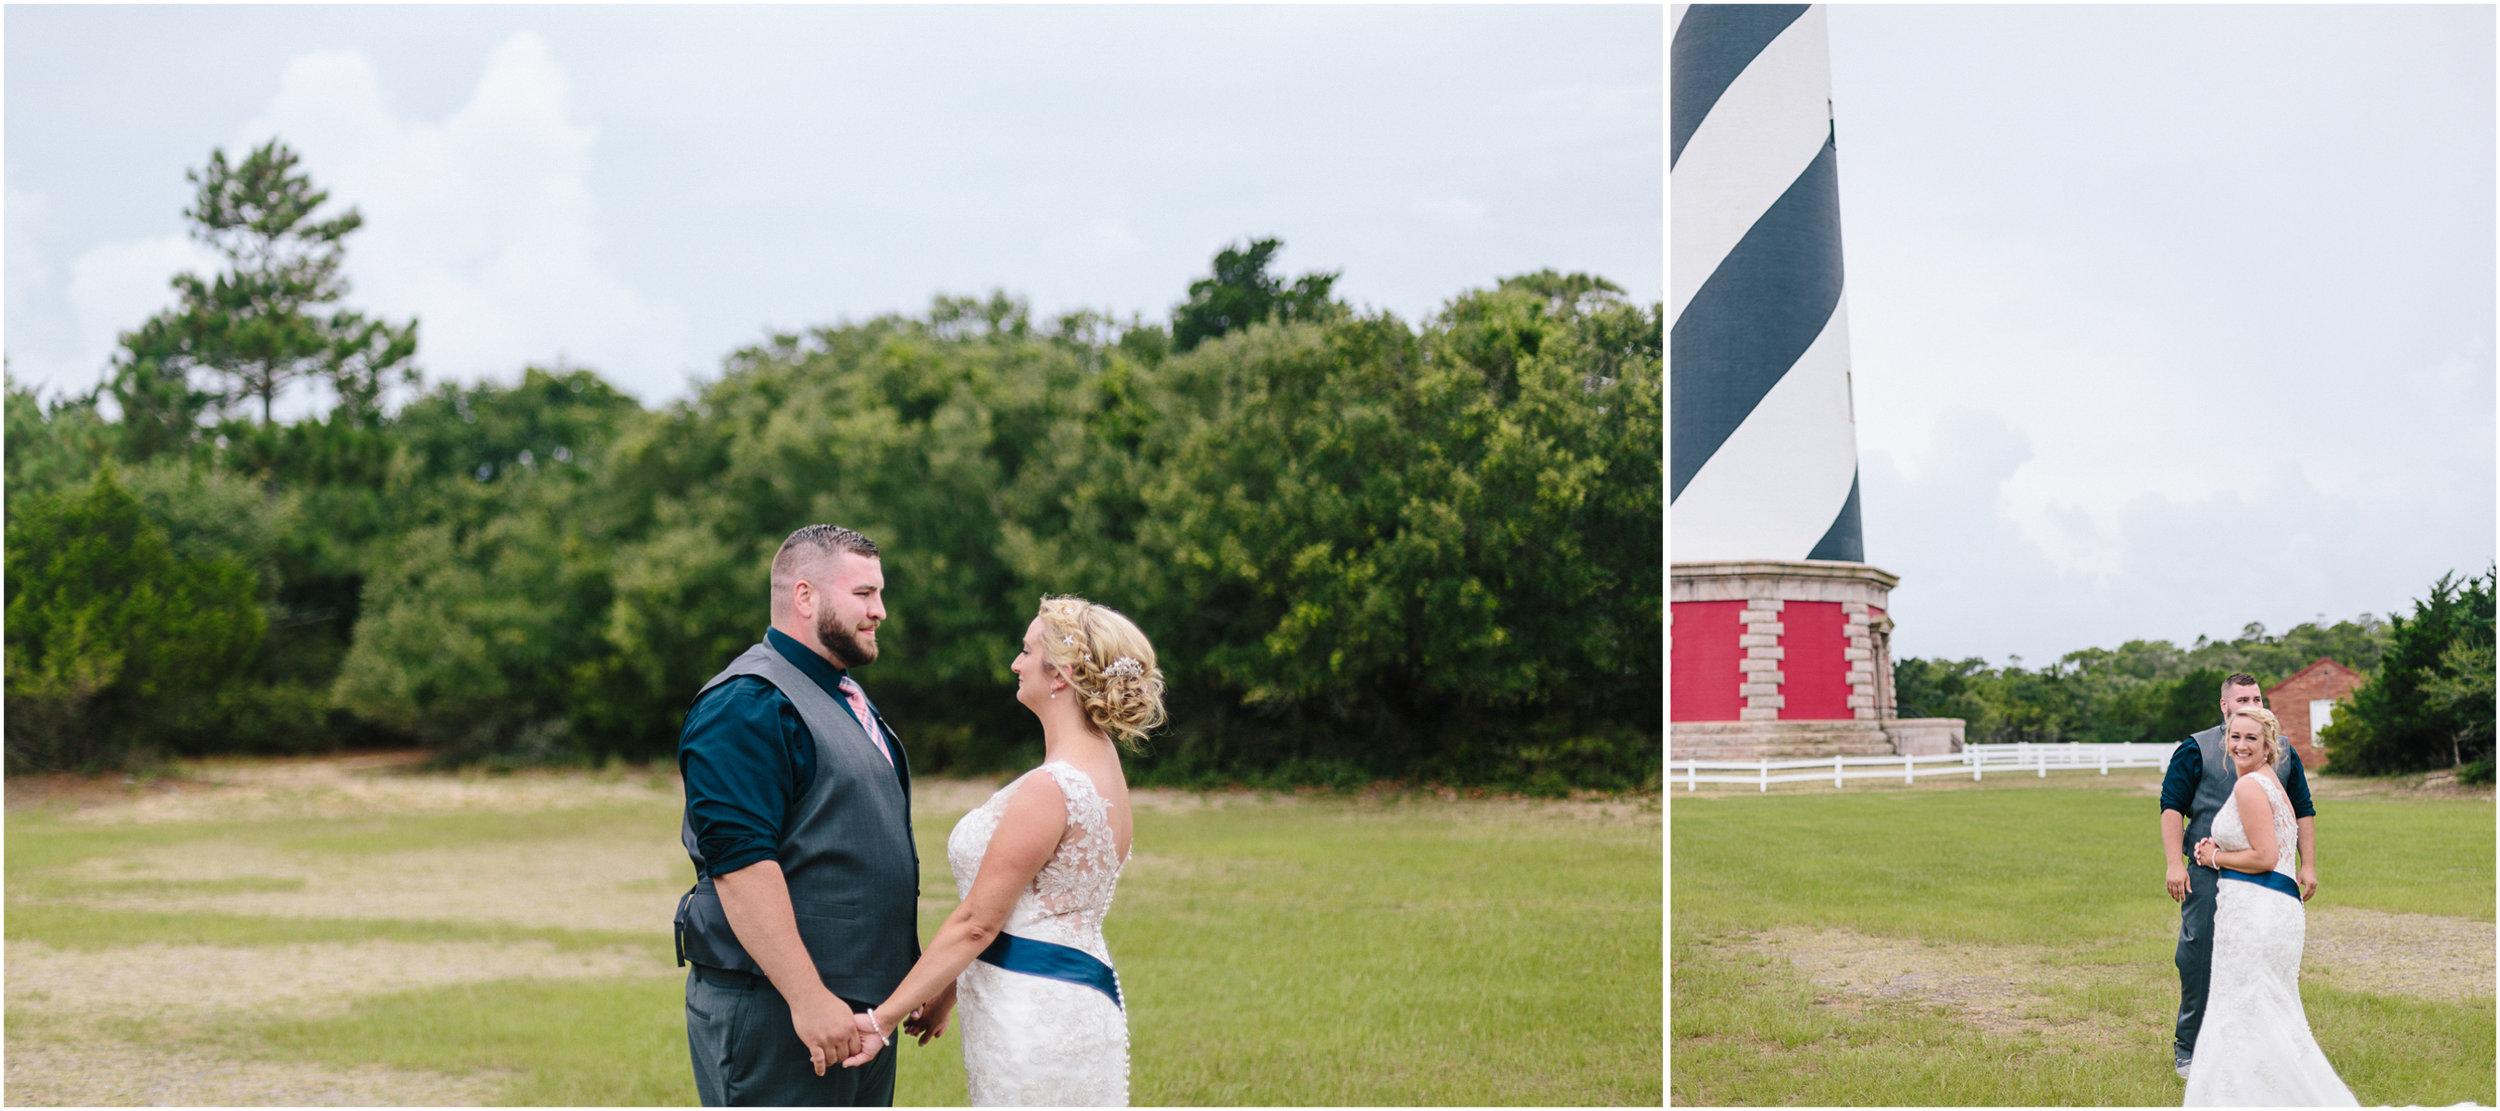 alyssa barletter photography buxton north carolina outer banks obx cape hatteras elopement intmate beach wedding-20.jpg